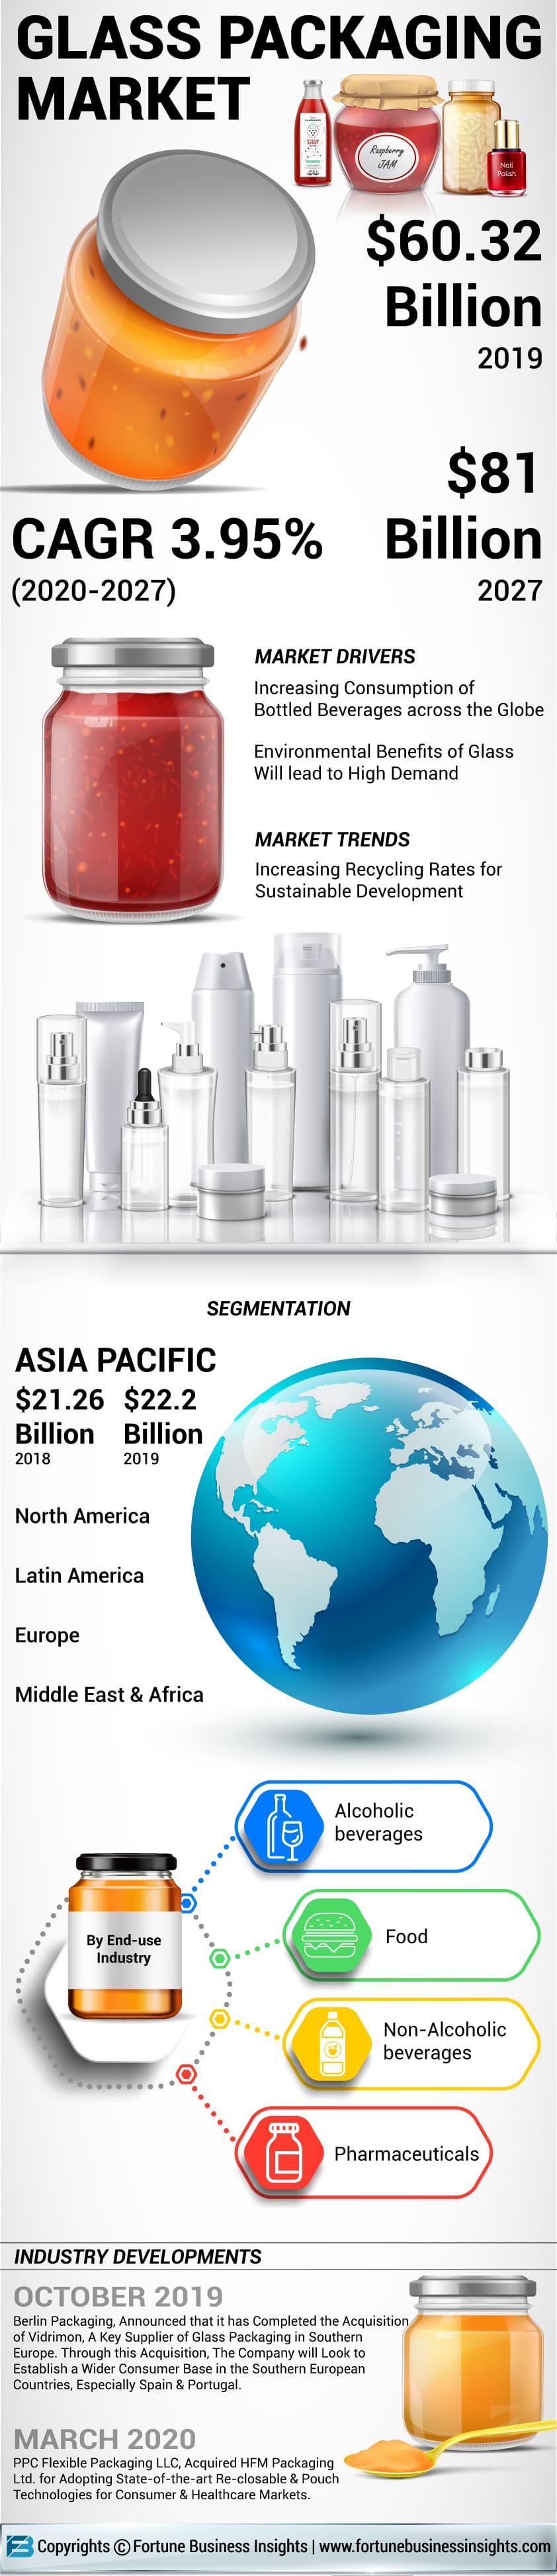 Glass Packaging Market